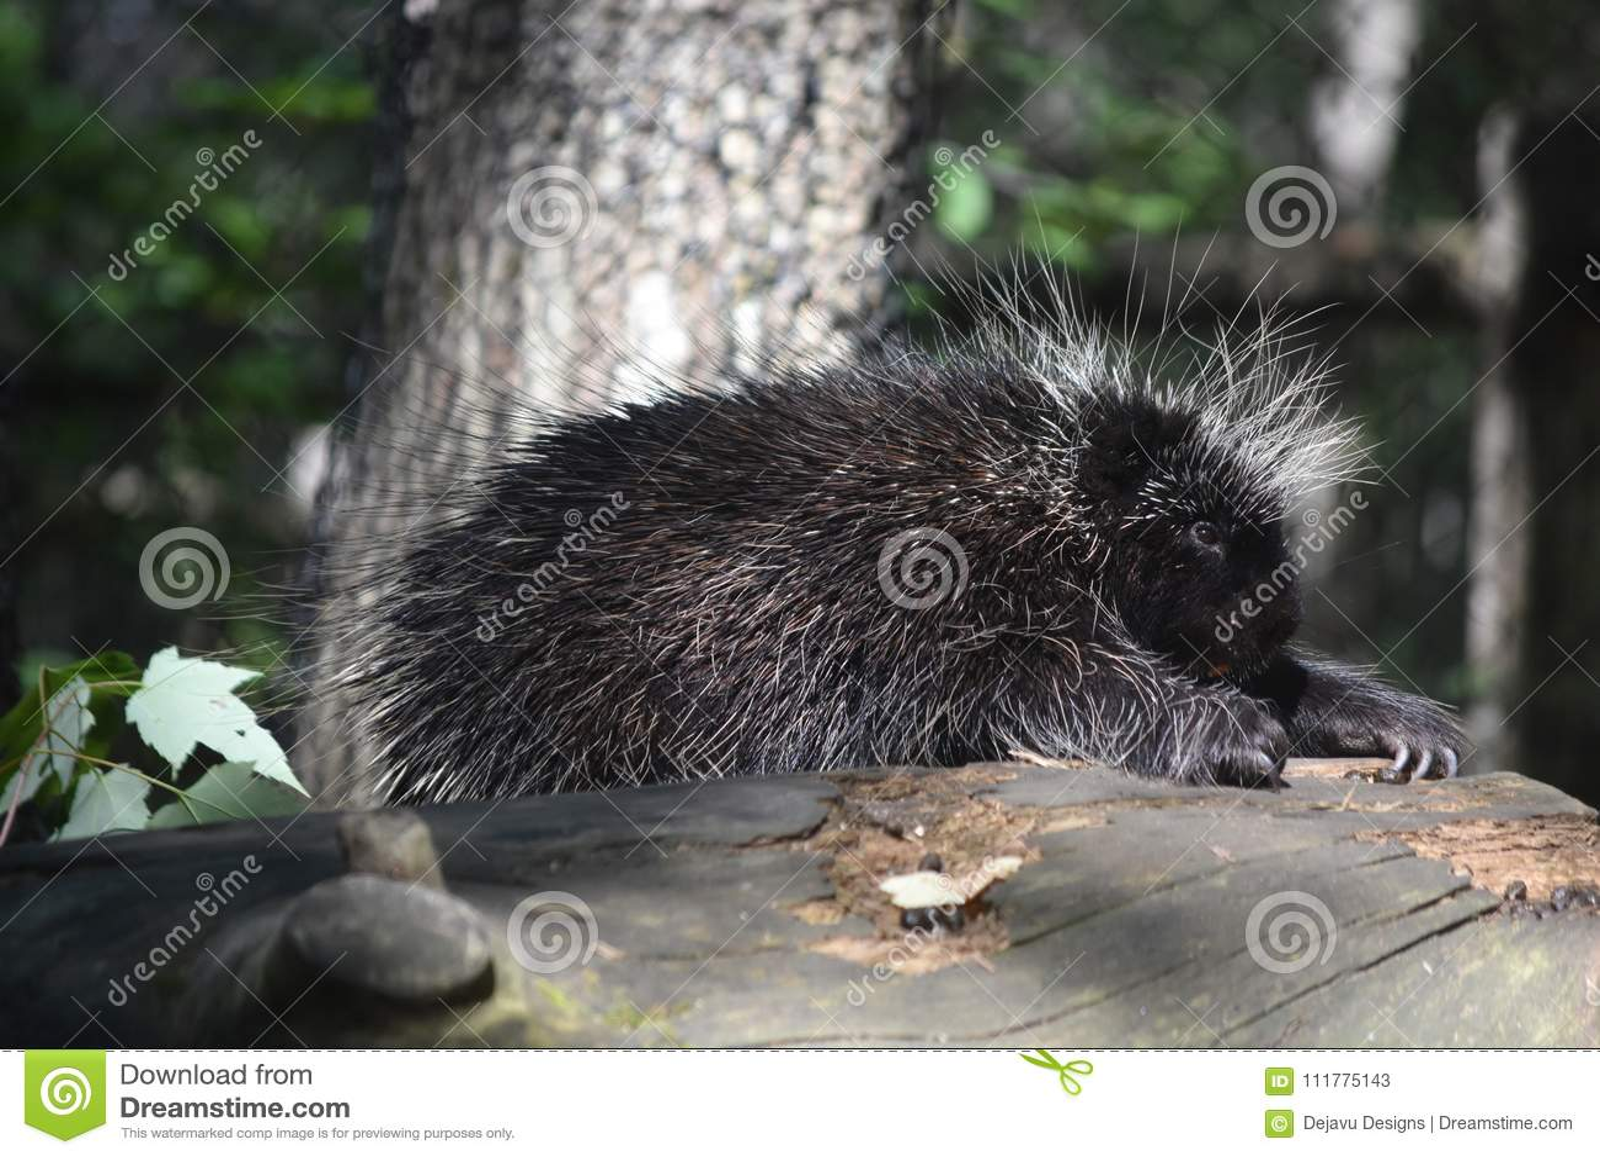 Adorable black porcupine climbing over a log